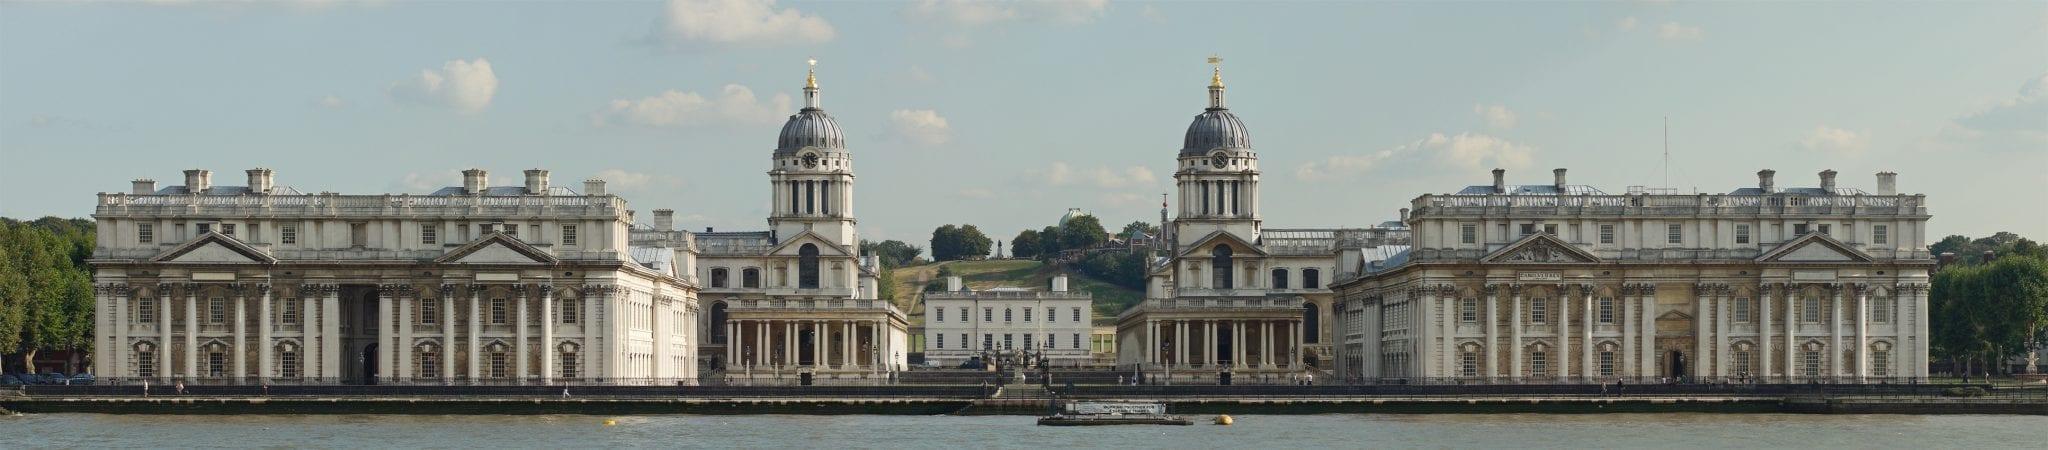 Old Royal Naval College Universidad en Greenwich